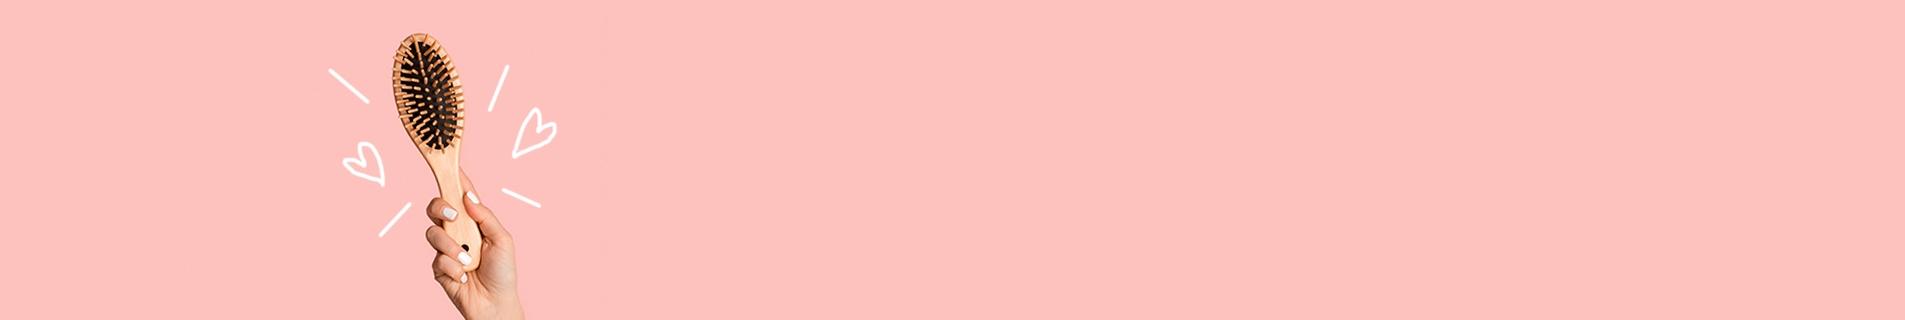 Soin capillaire pas cher | Produit cheveux | SAGA Cosmetics